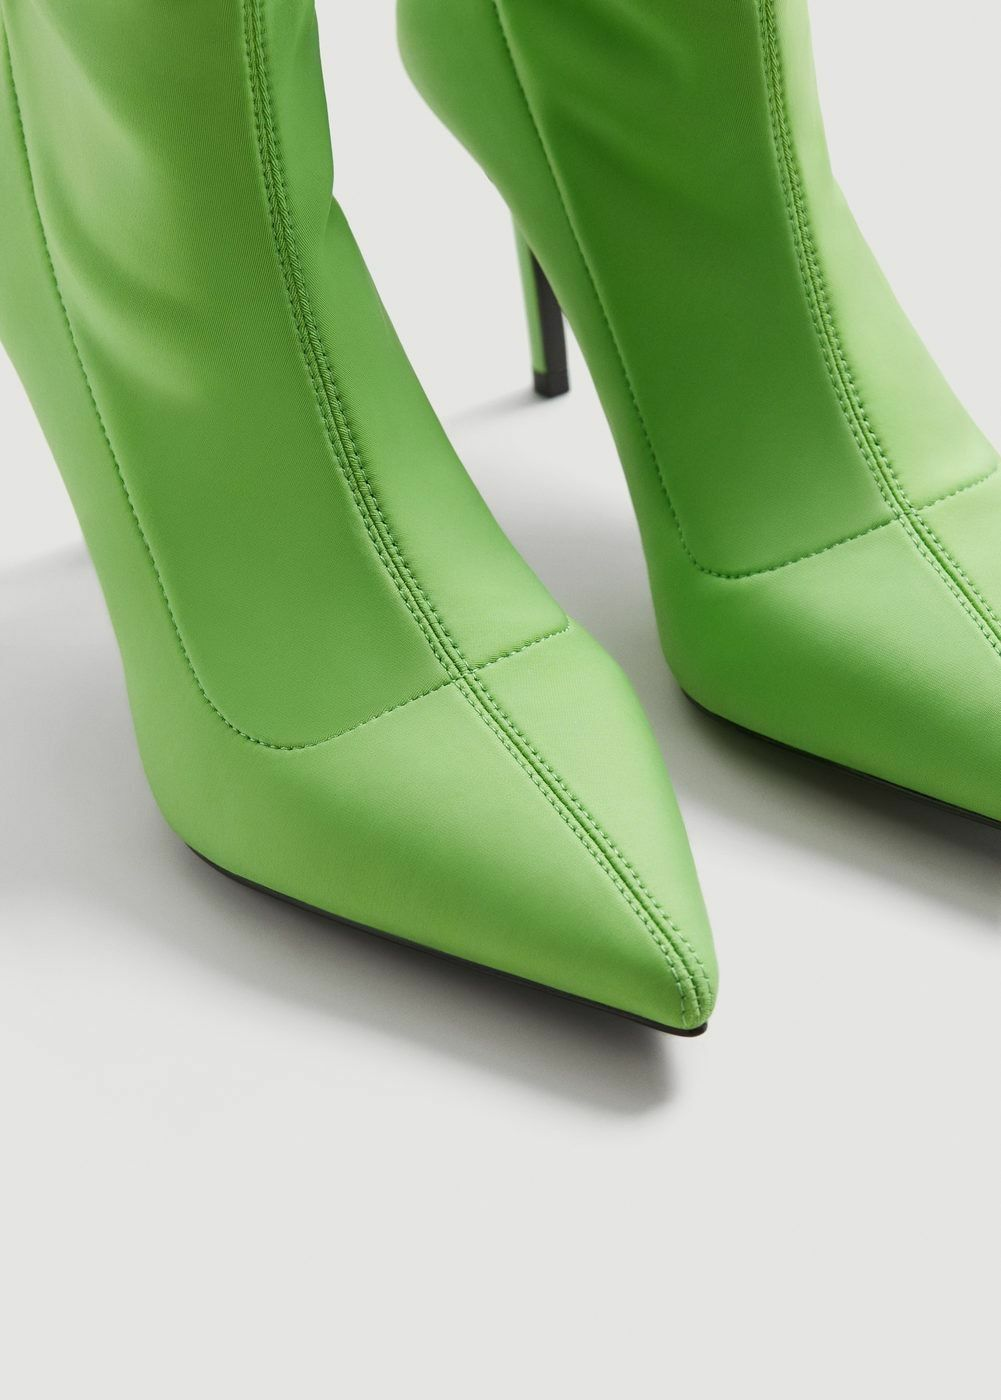 MANGO GREEN HIGH HEEL STRETCH SOCK SOCK SOCK ANKLE BOOTS CINDA SIZE 6UK 39EU 8US RARE 8e342b